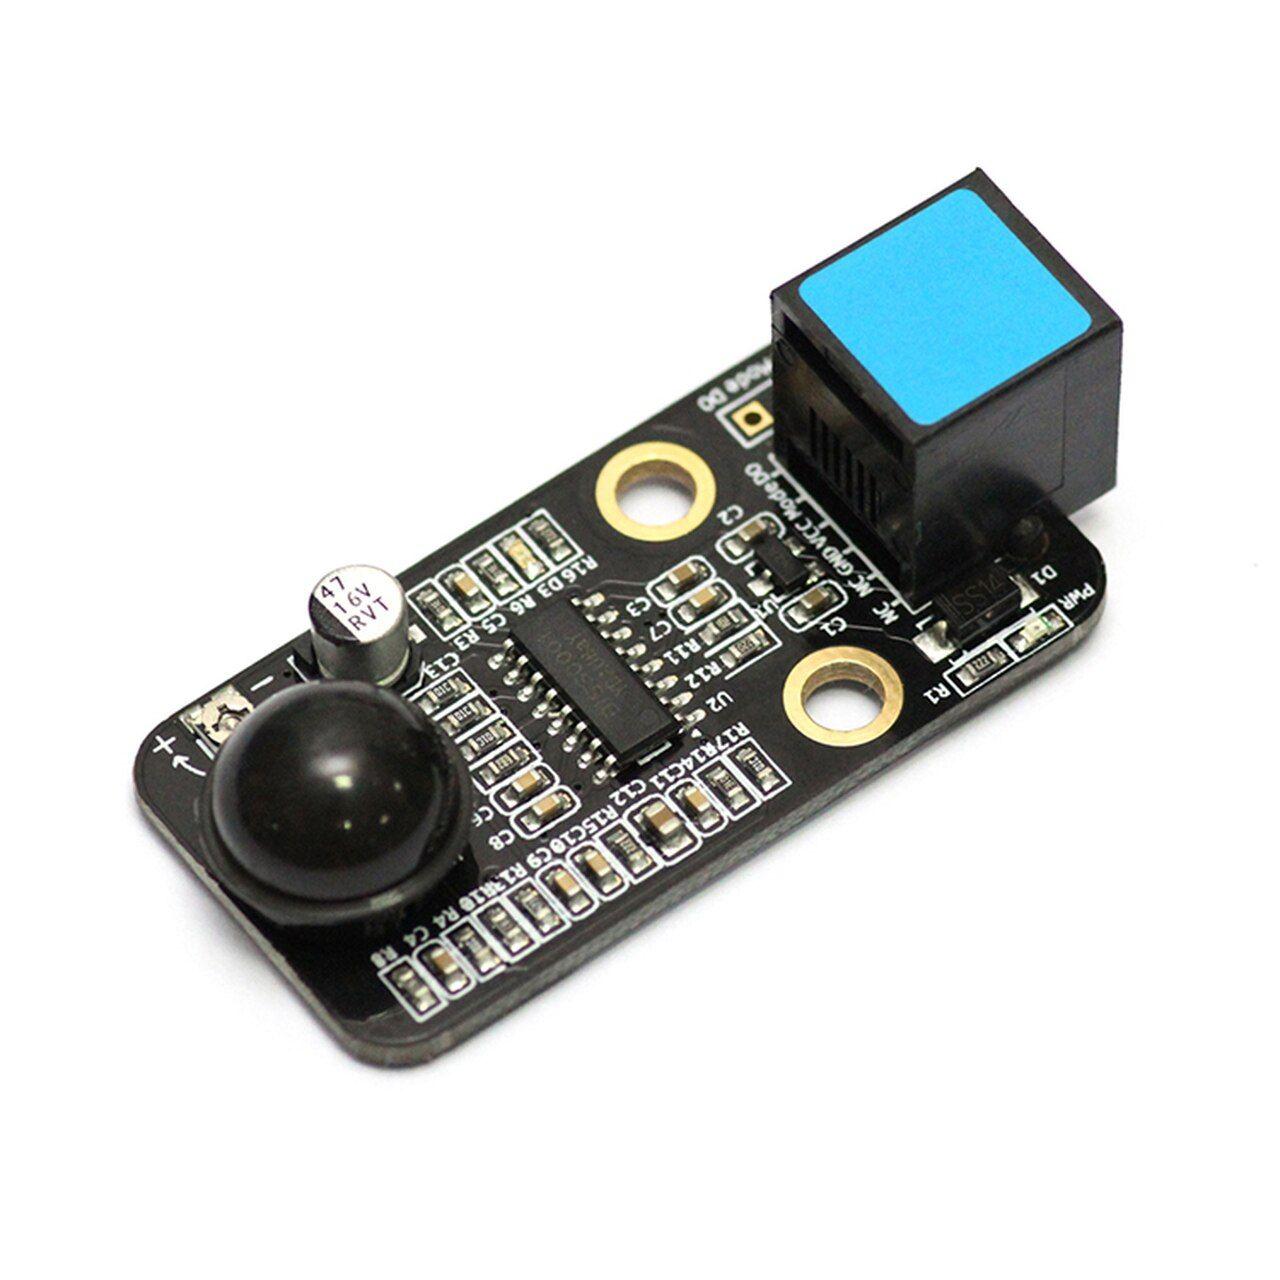 Makeblock Me PIR Motion Sensor V1